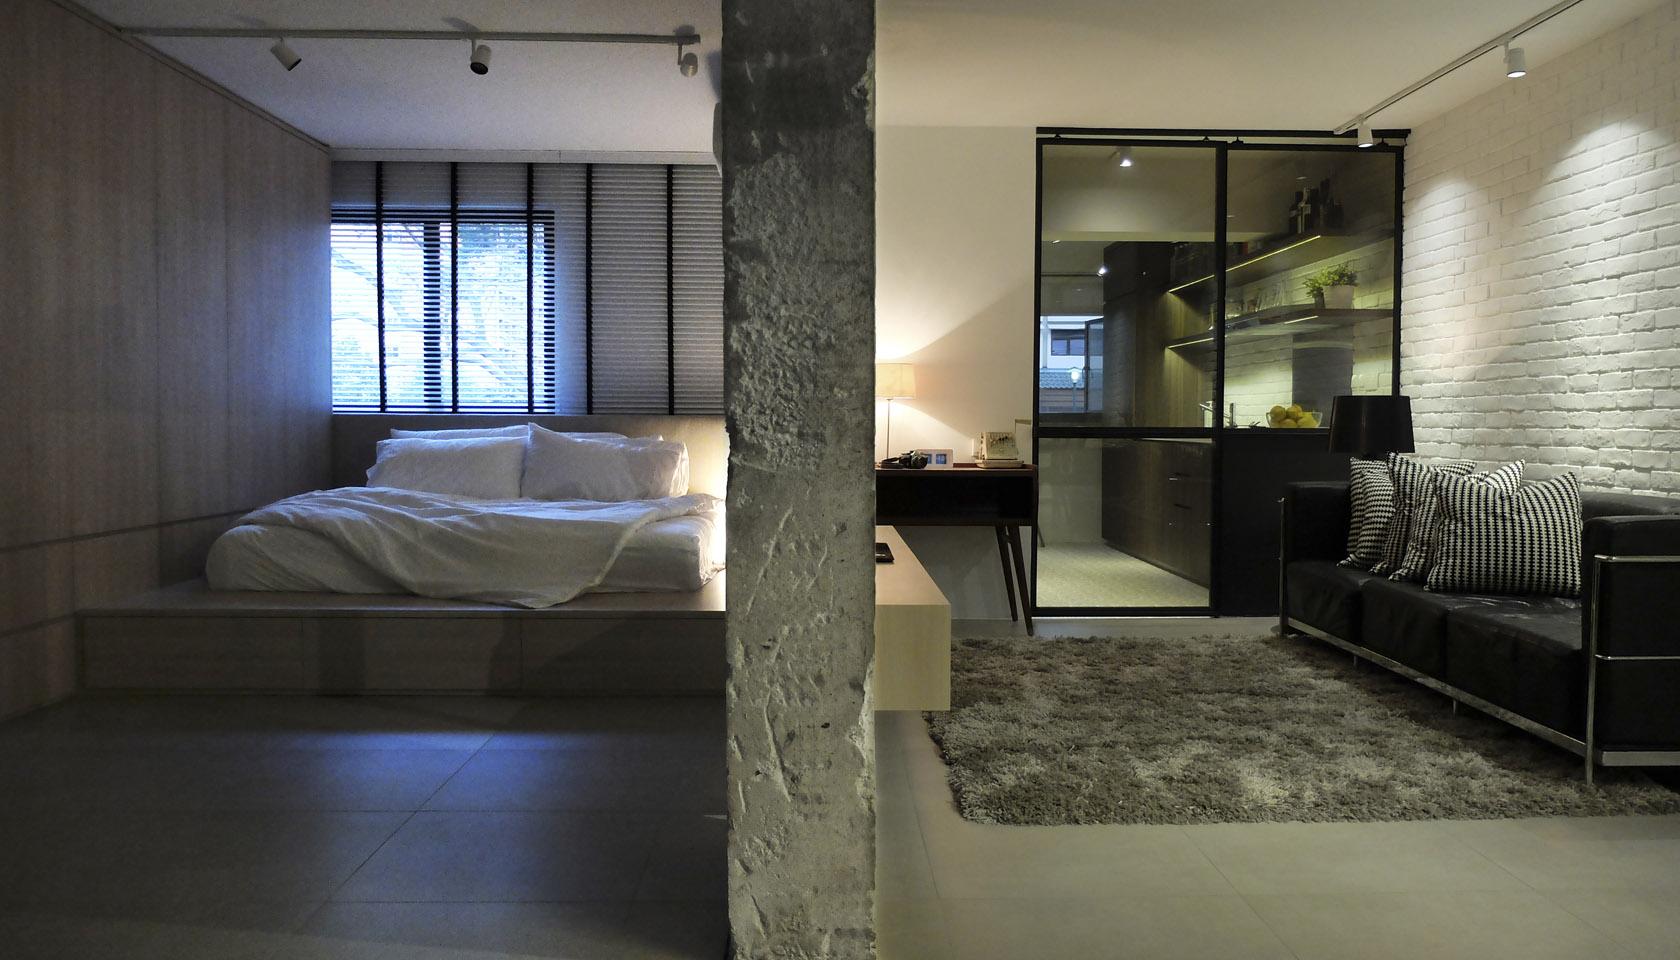 3 Room Flat 0932 design consultants | a 3-room hdb flat transformation